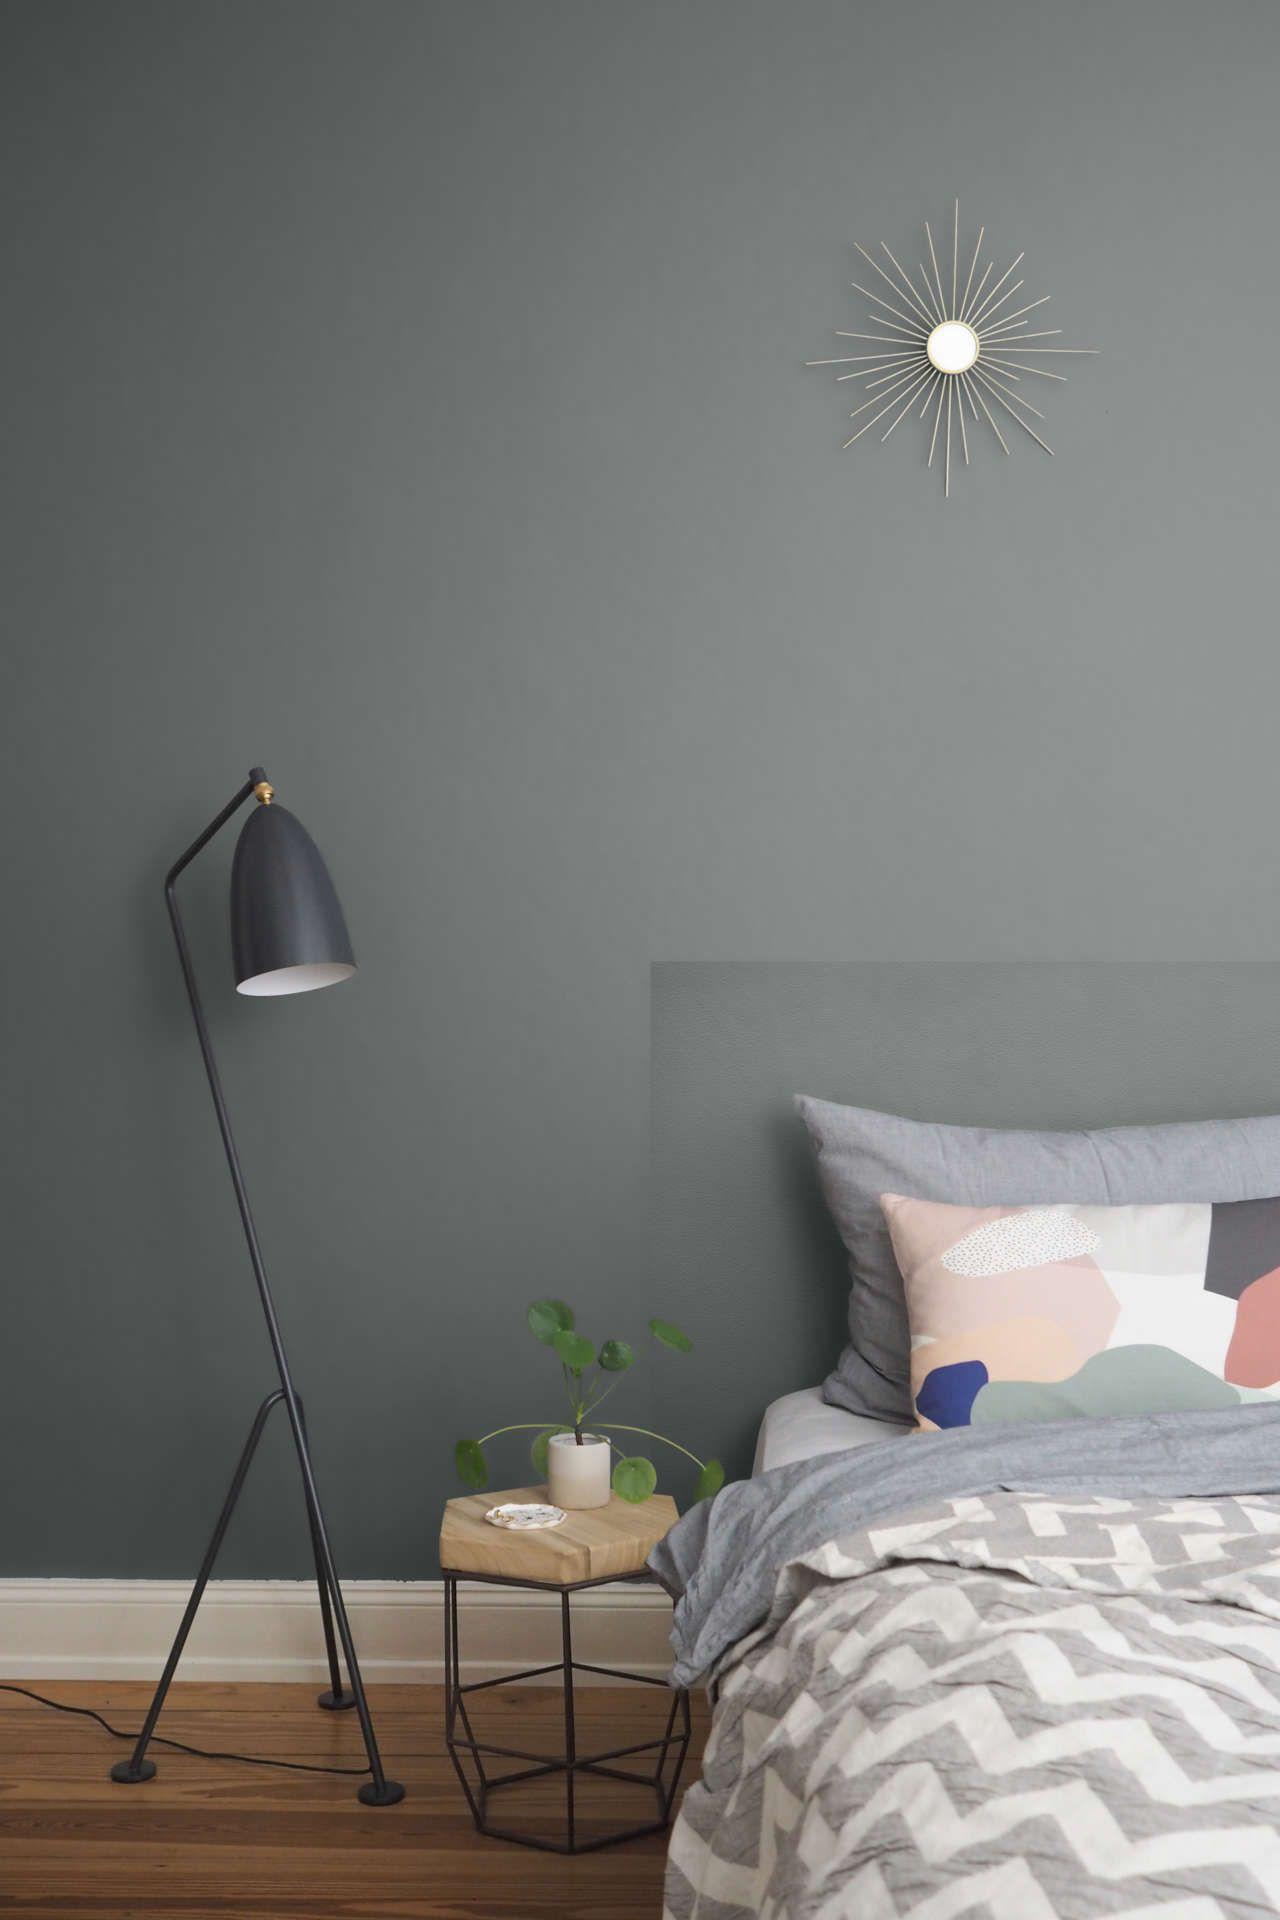 Diy Betthaupt Mit Sandstrukturfarbe Farbige Wande Diy Bett Zimmer